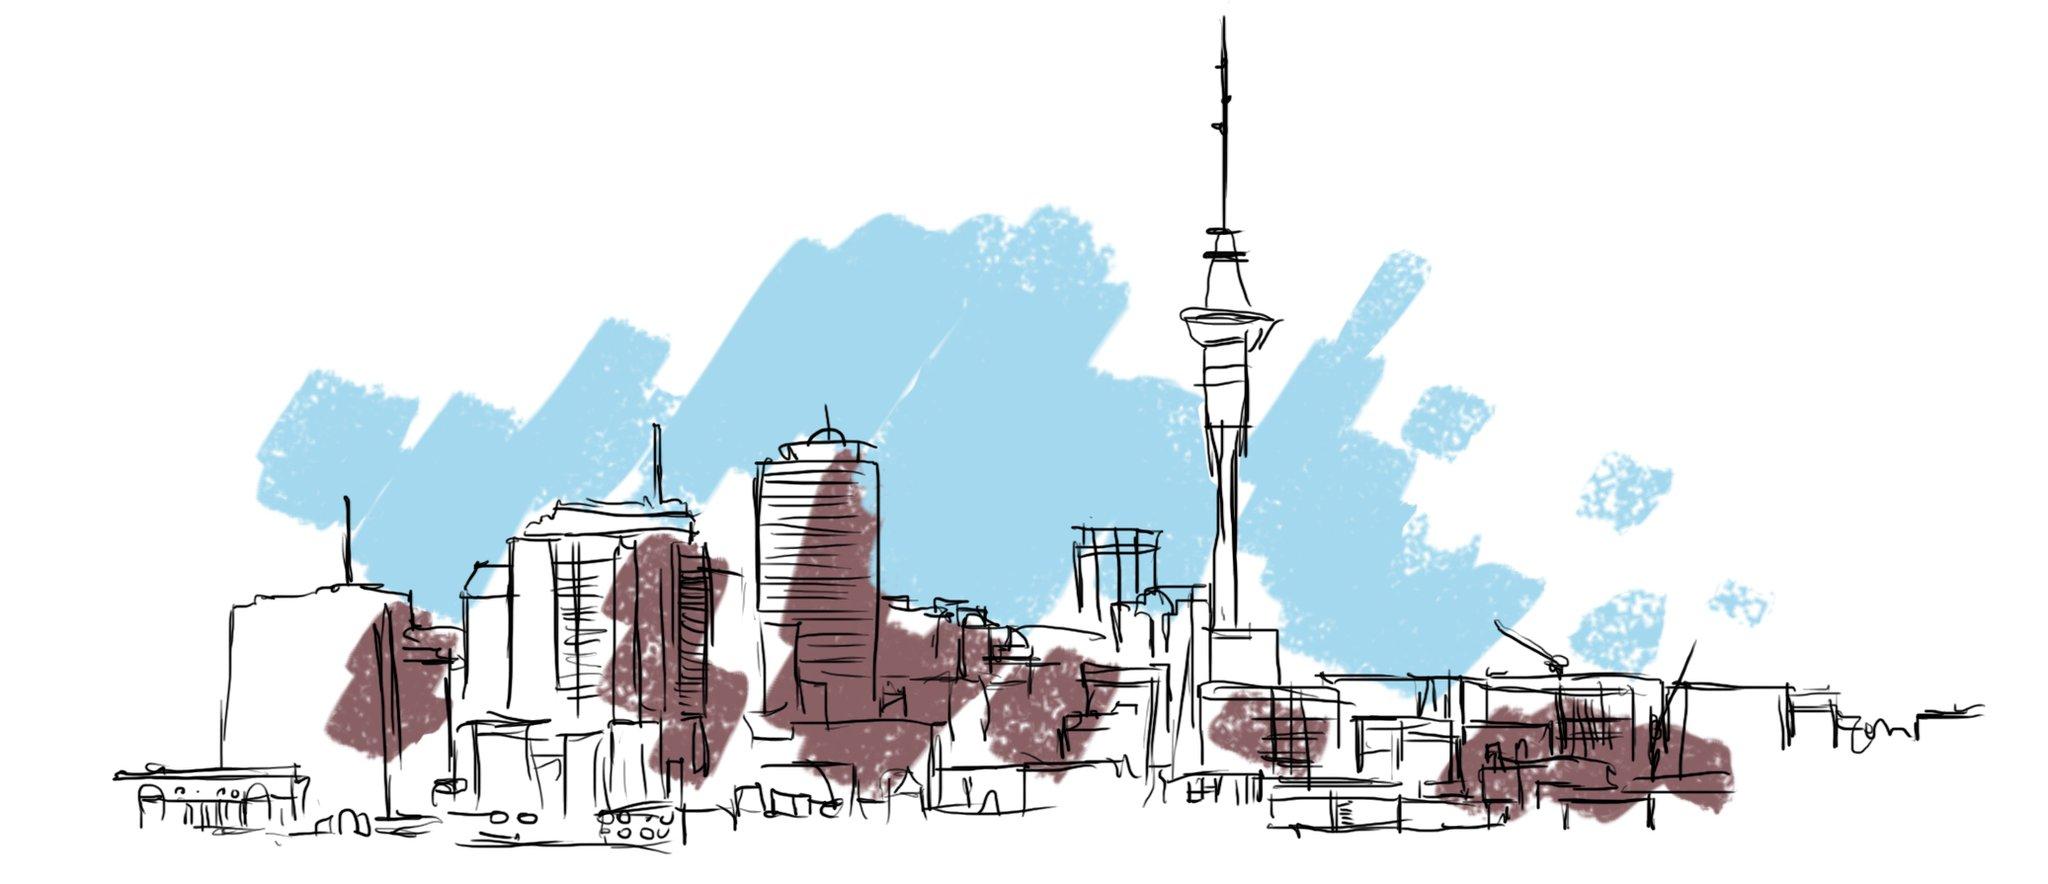 auckland-city-cityscape-drawing-sketch-izak